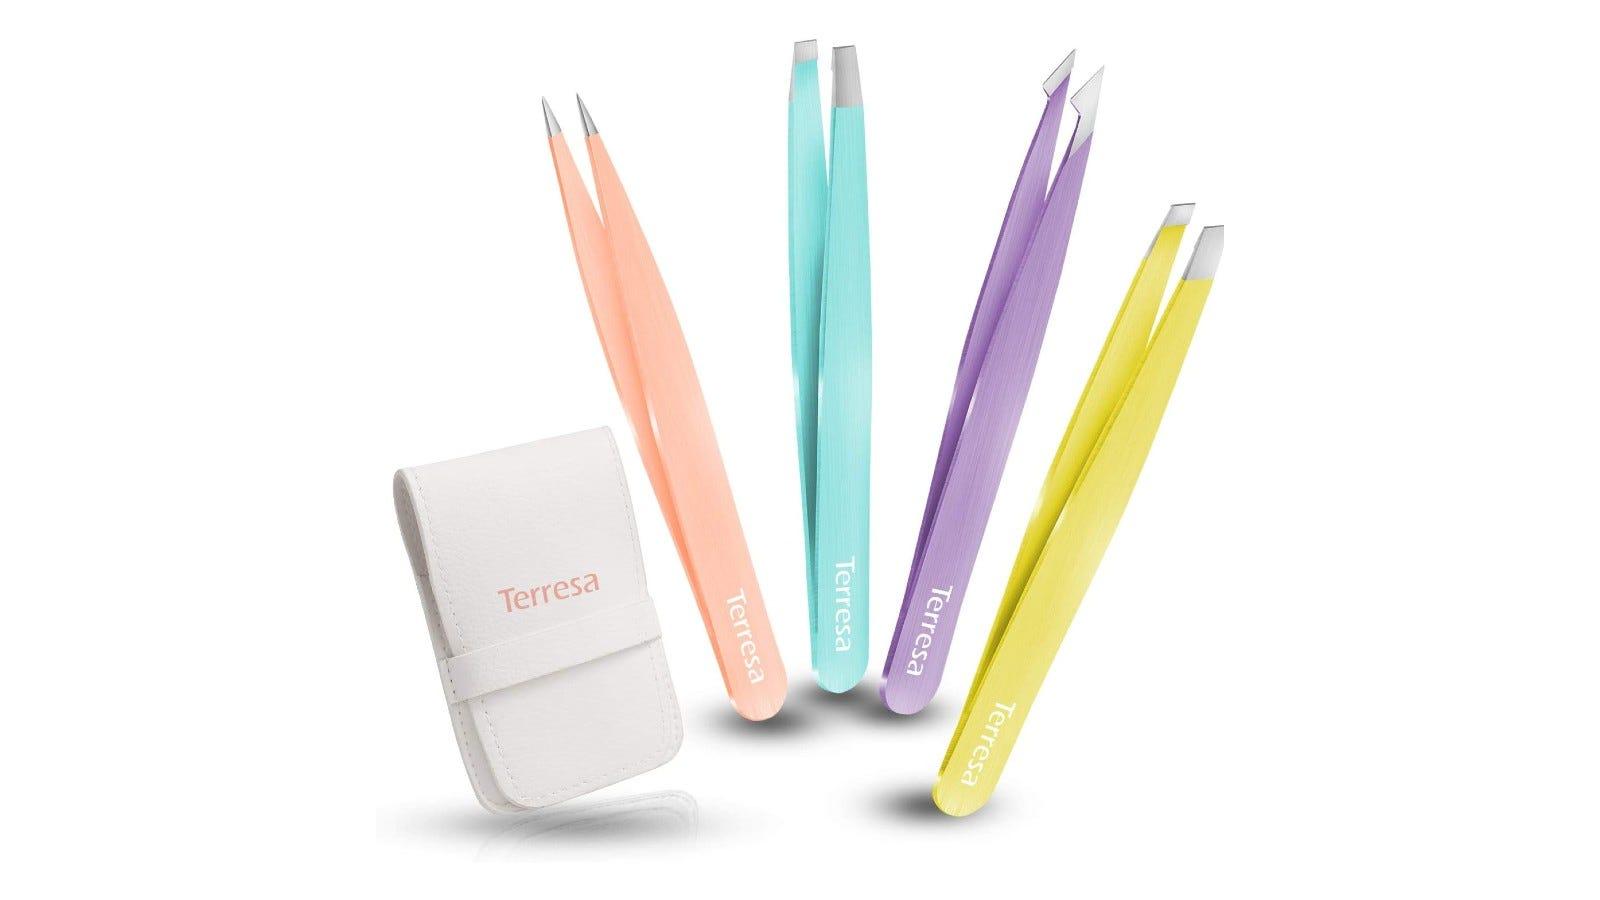 A set of tweezers that comes in four unique colors